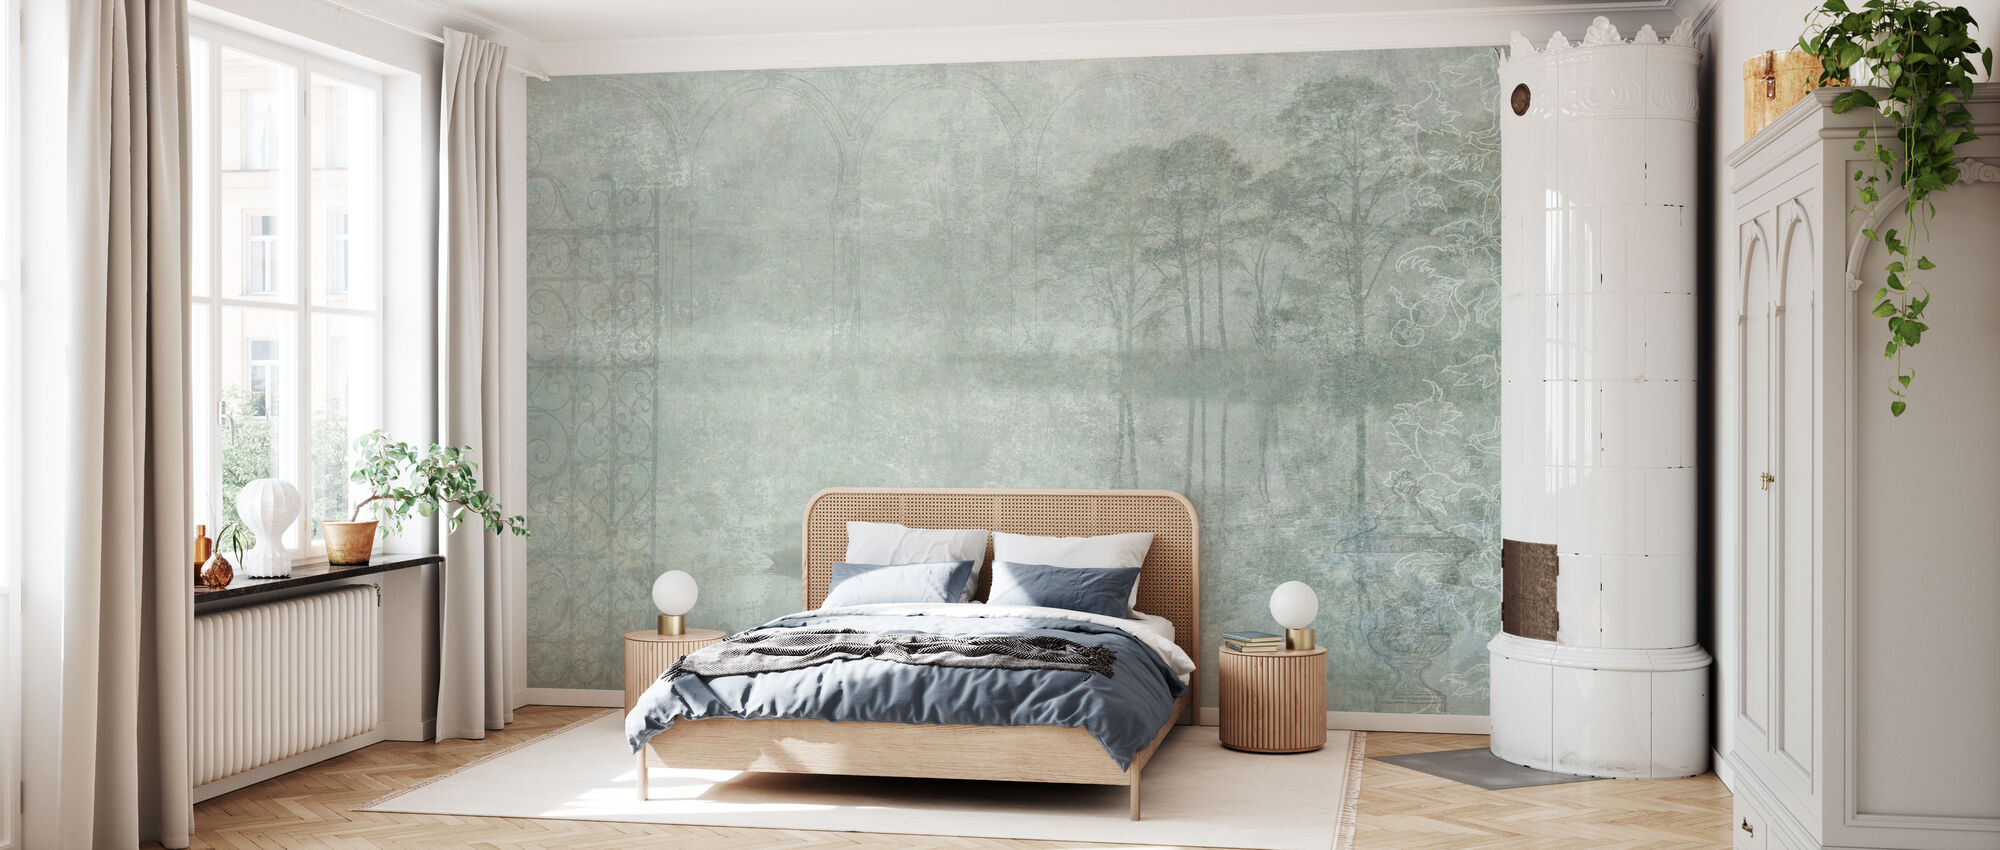 Reminiscence Series Swan - Wallpaper - Bedroom